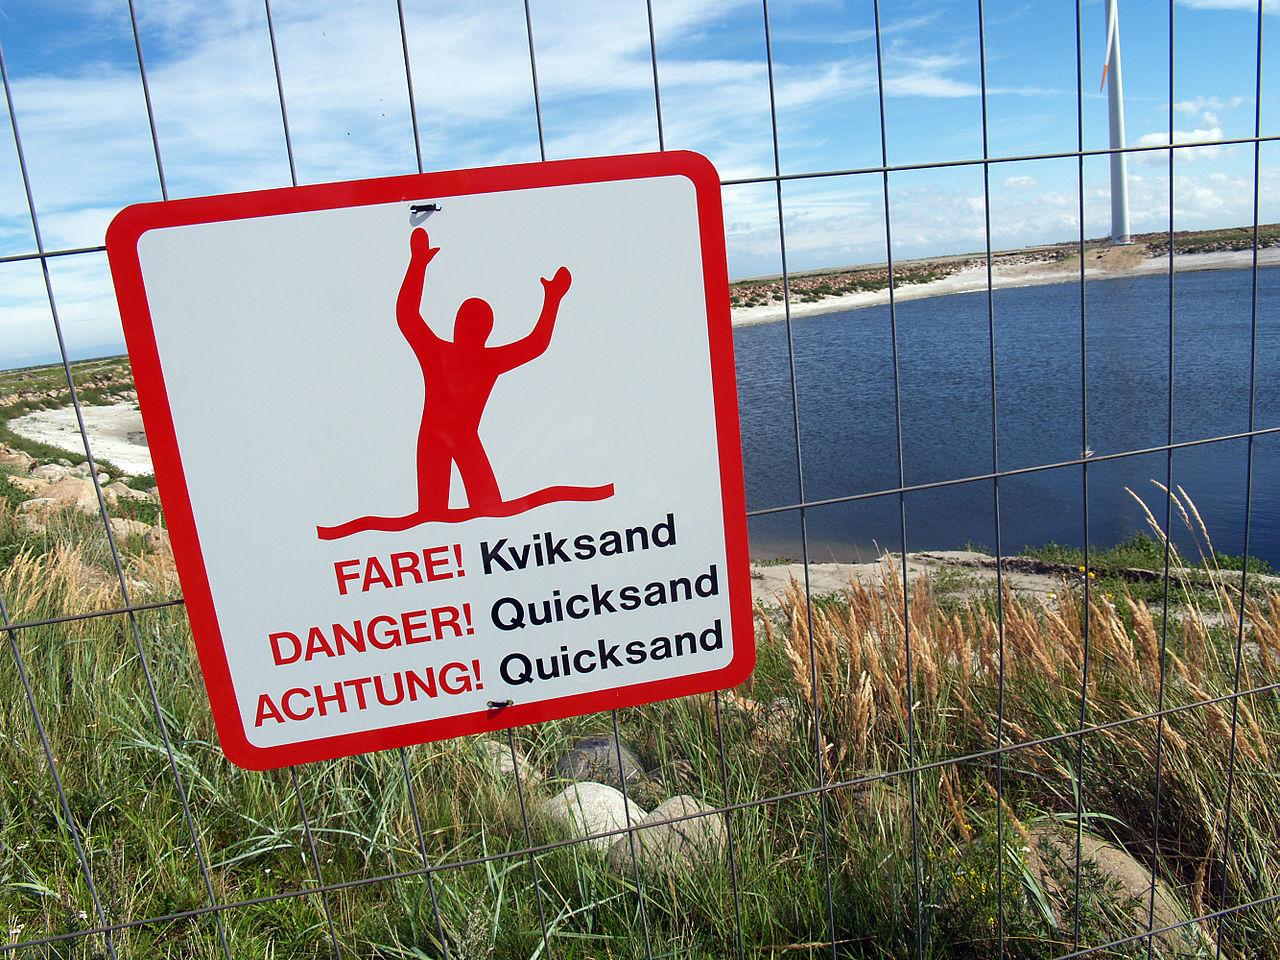 1280px-Quicksand-warning-sign-denmark-2010